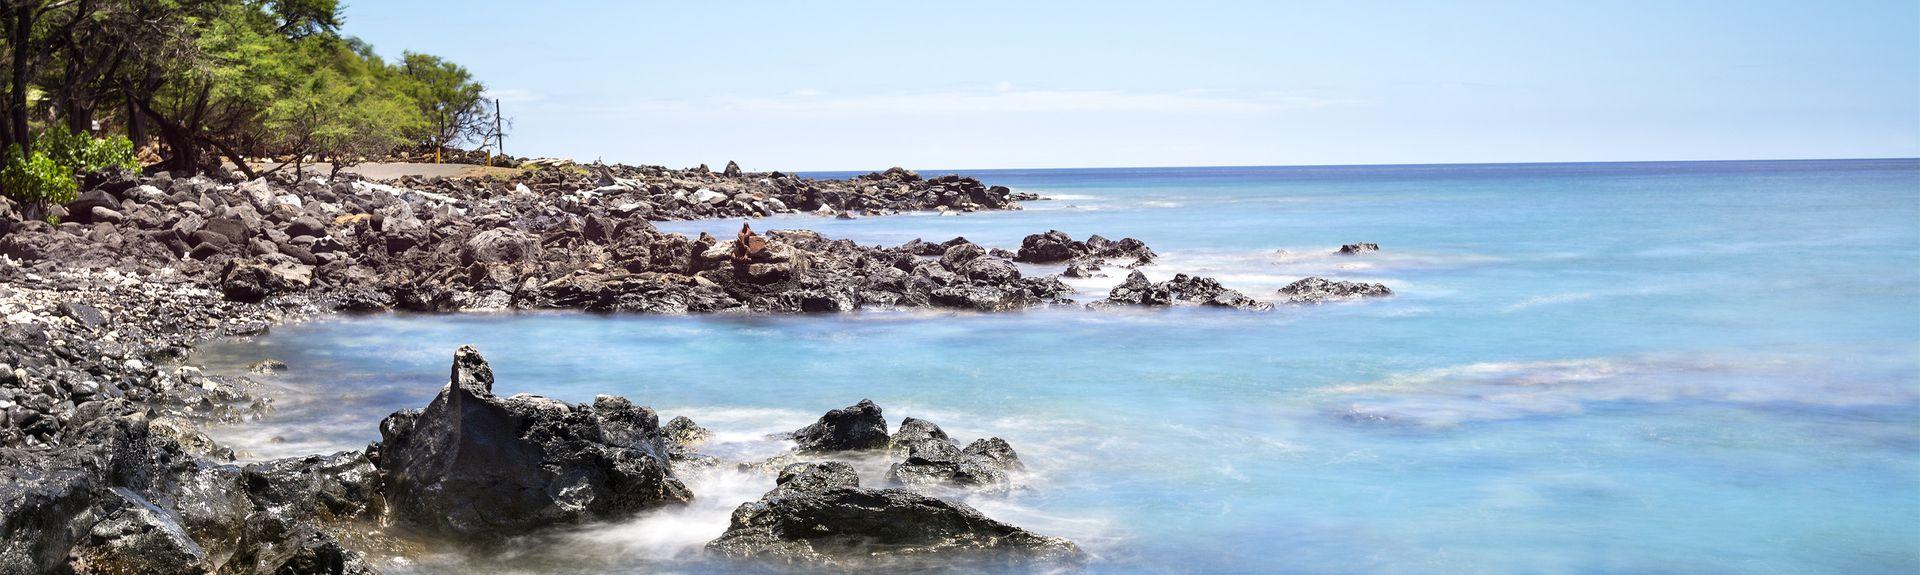 Kona Reef (Hōlualoa, Hawaii, United States)